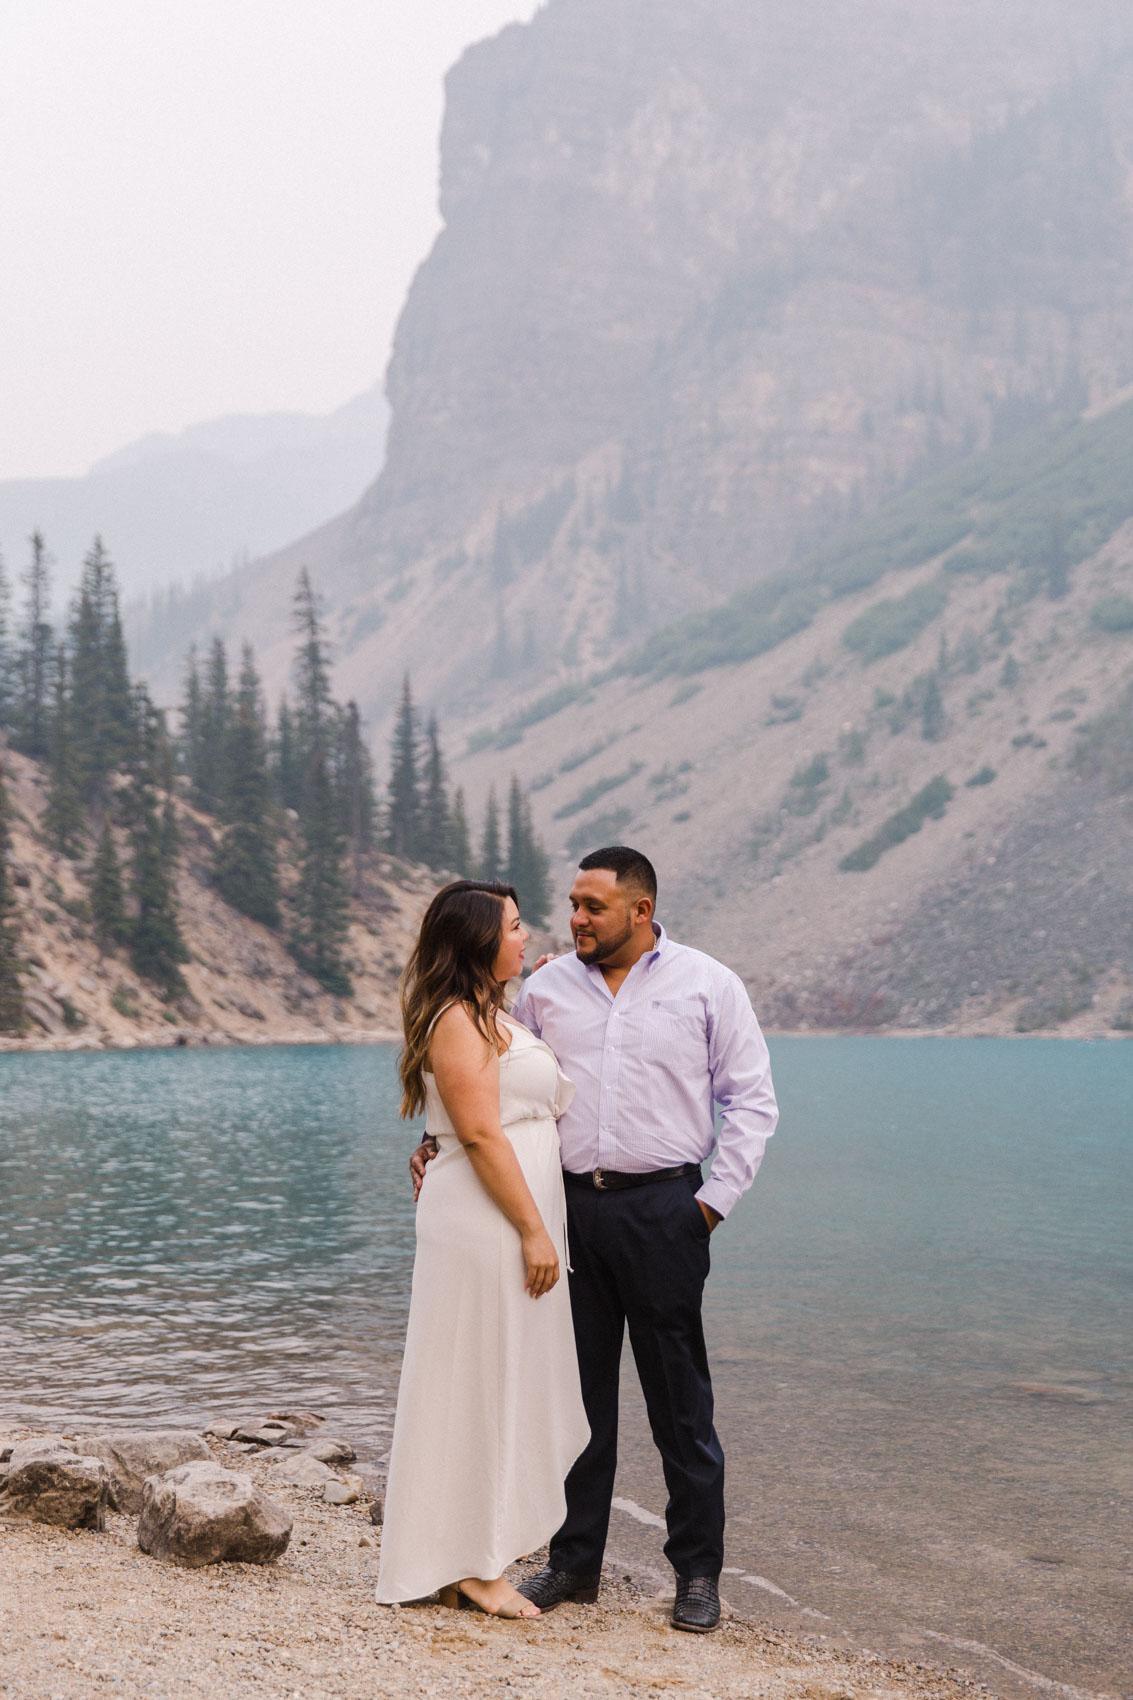 Lake Louise Mountain Engagement Photographer Moraine Lake Wedding Jennie Guenard Photography-18.jpg